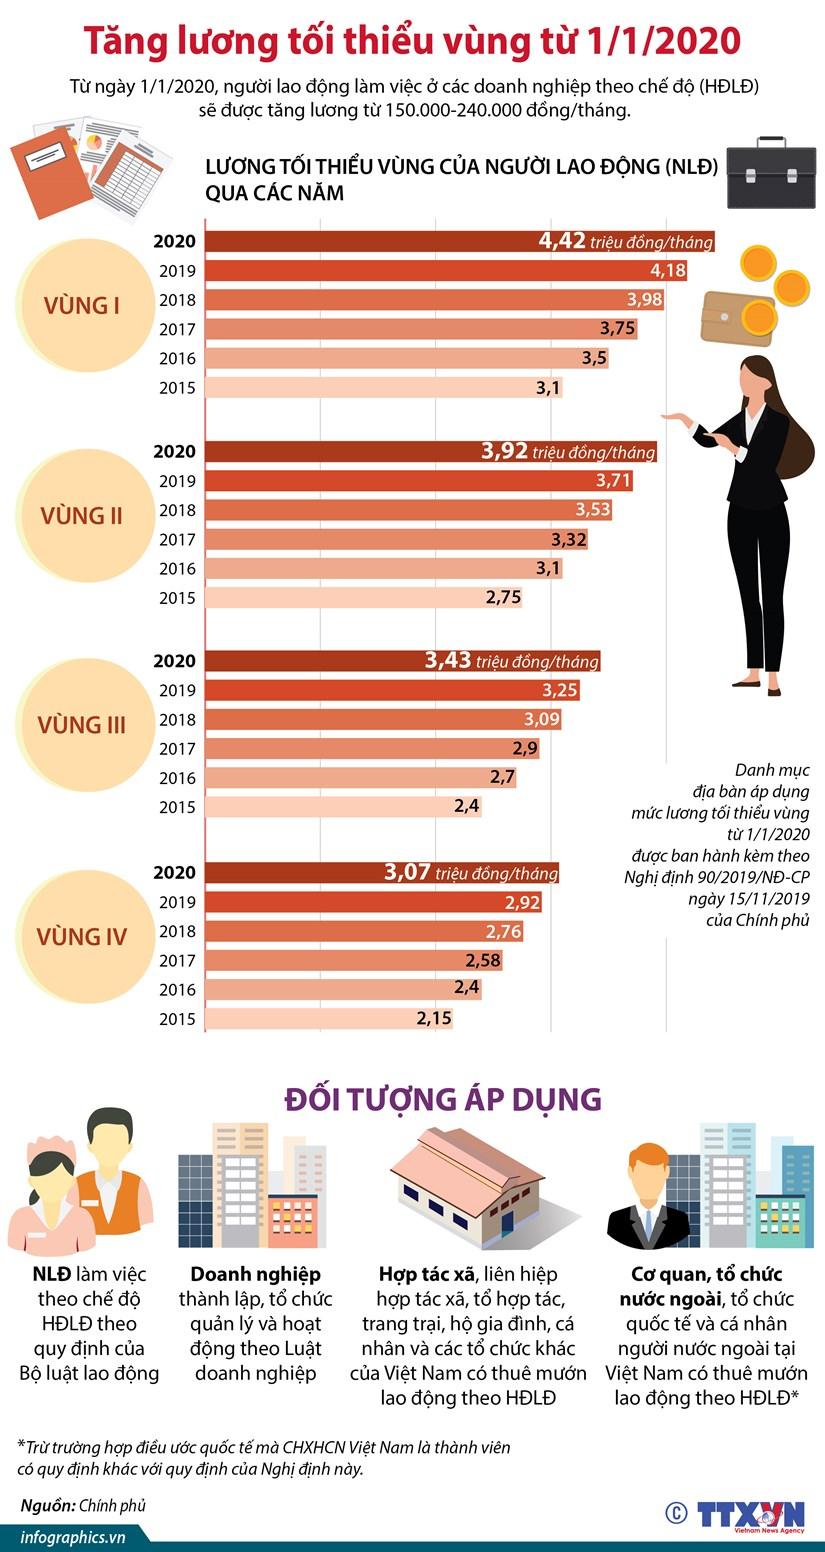 [Infographics] Tang luong toi thieu vung tu ngay 1/1/2020 hinh anh 1